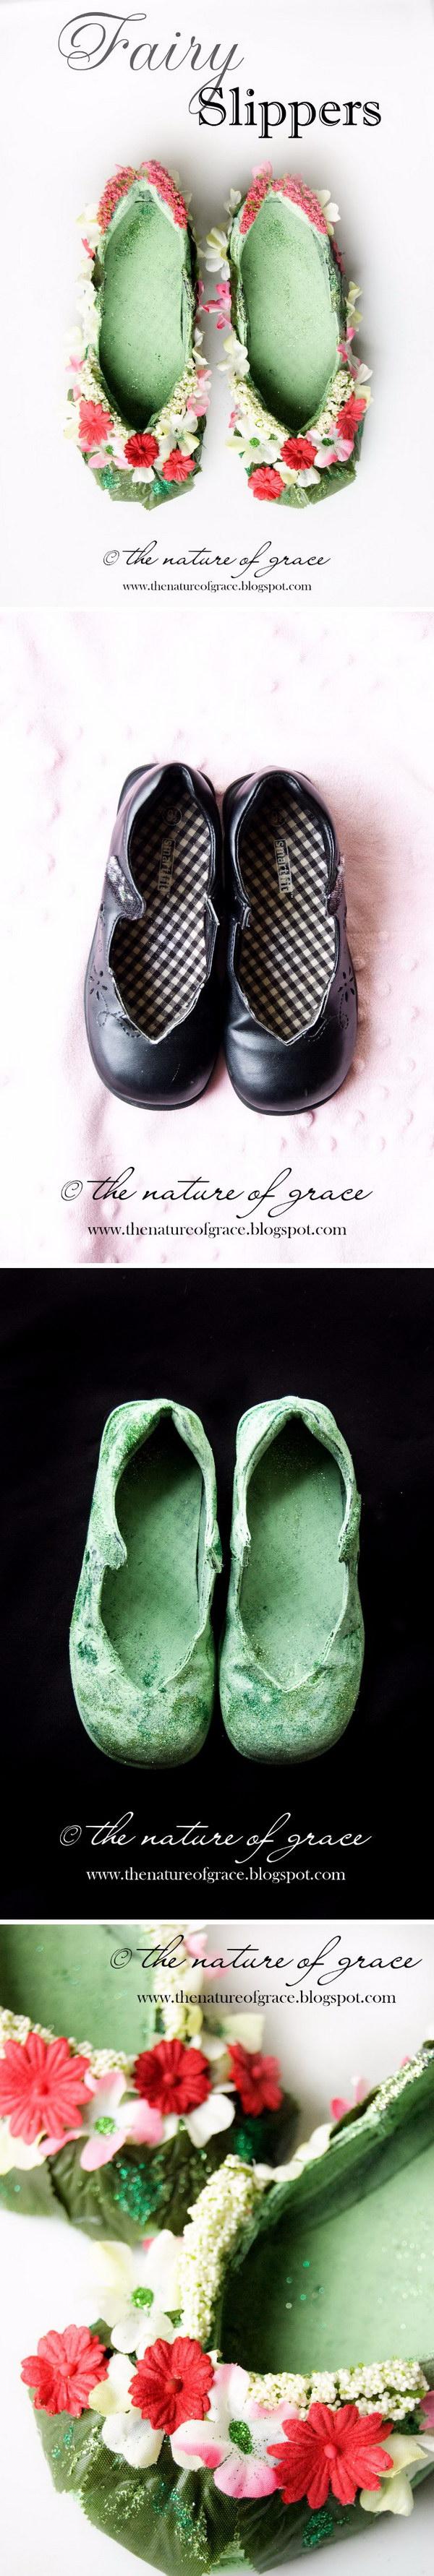 Fairy Shoes.